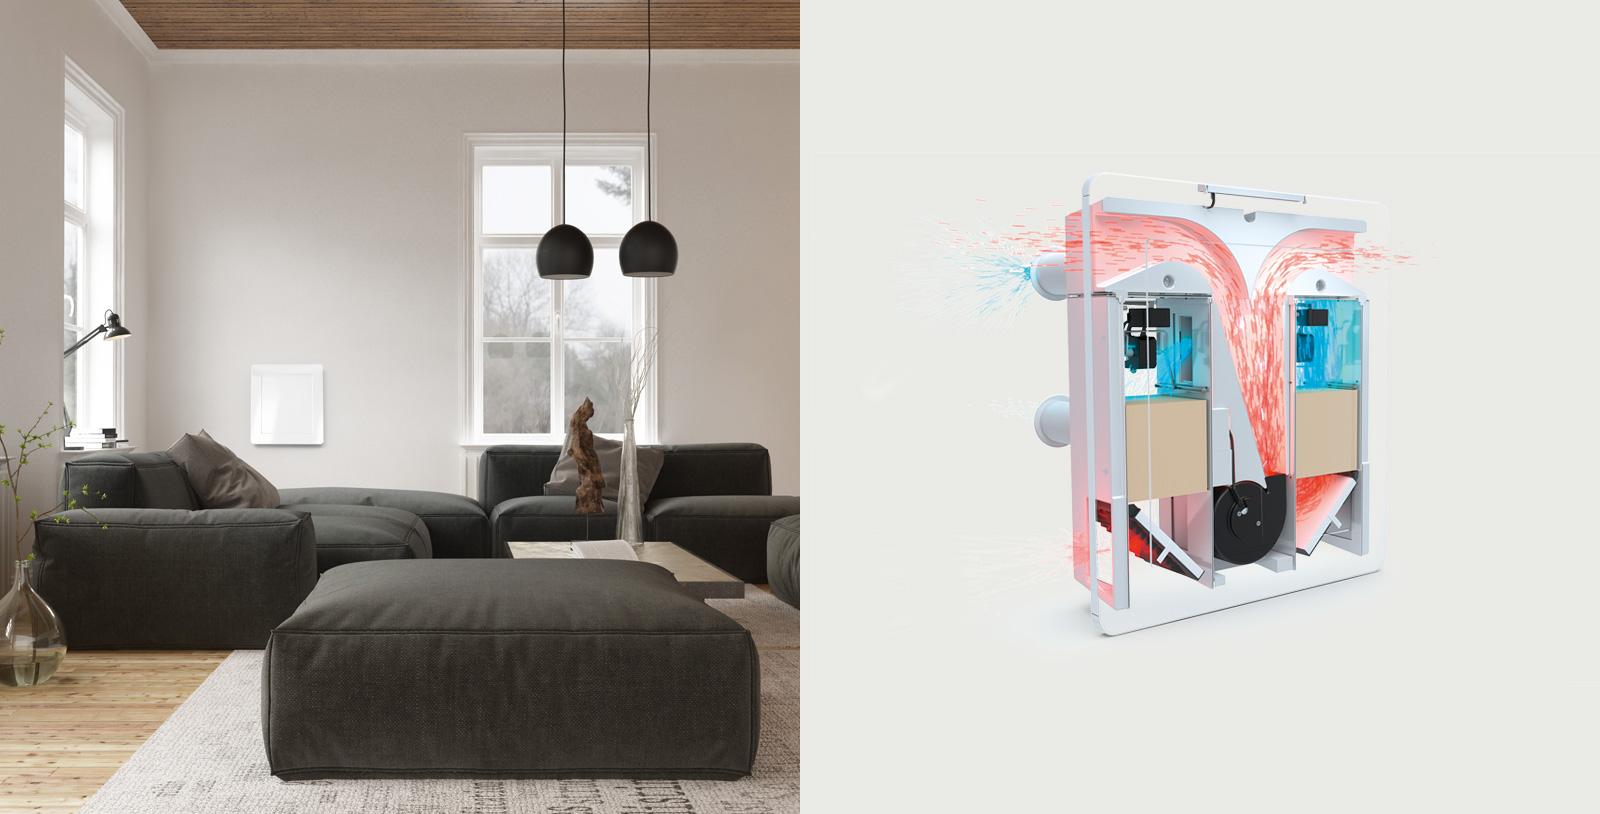 energieeffizienz beim l ften. Black Bedroom Furniture Sets. Home Design Ideas